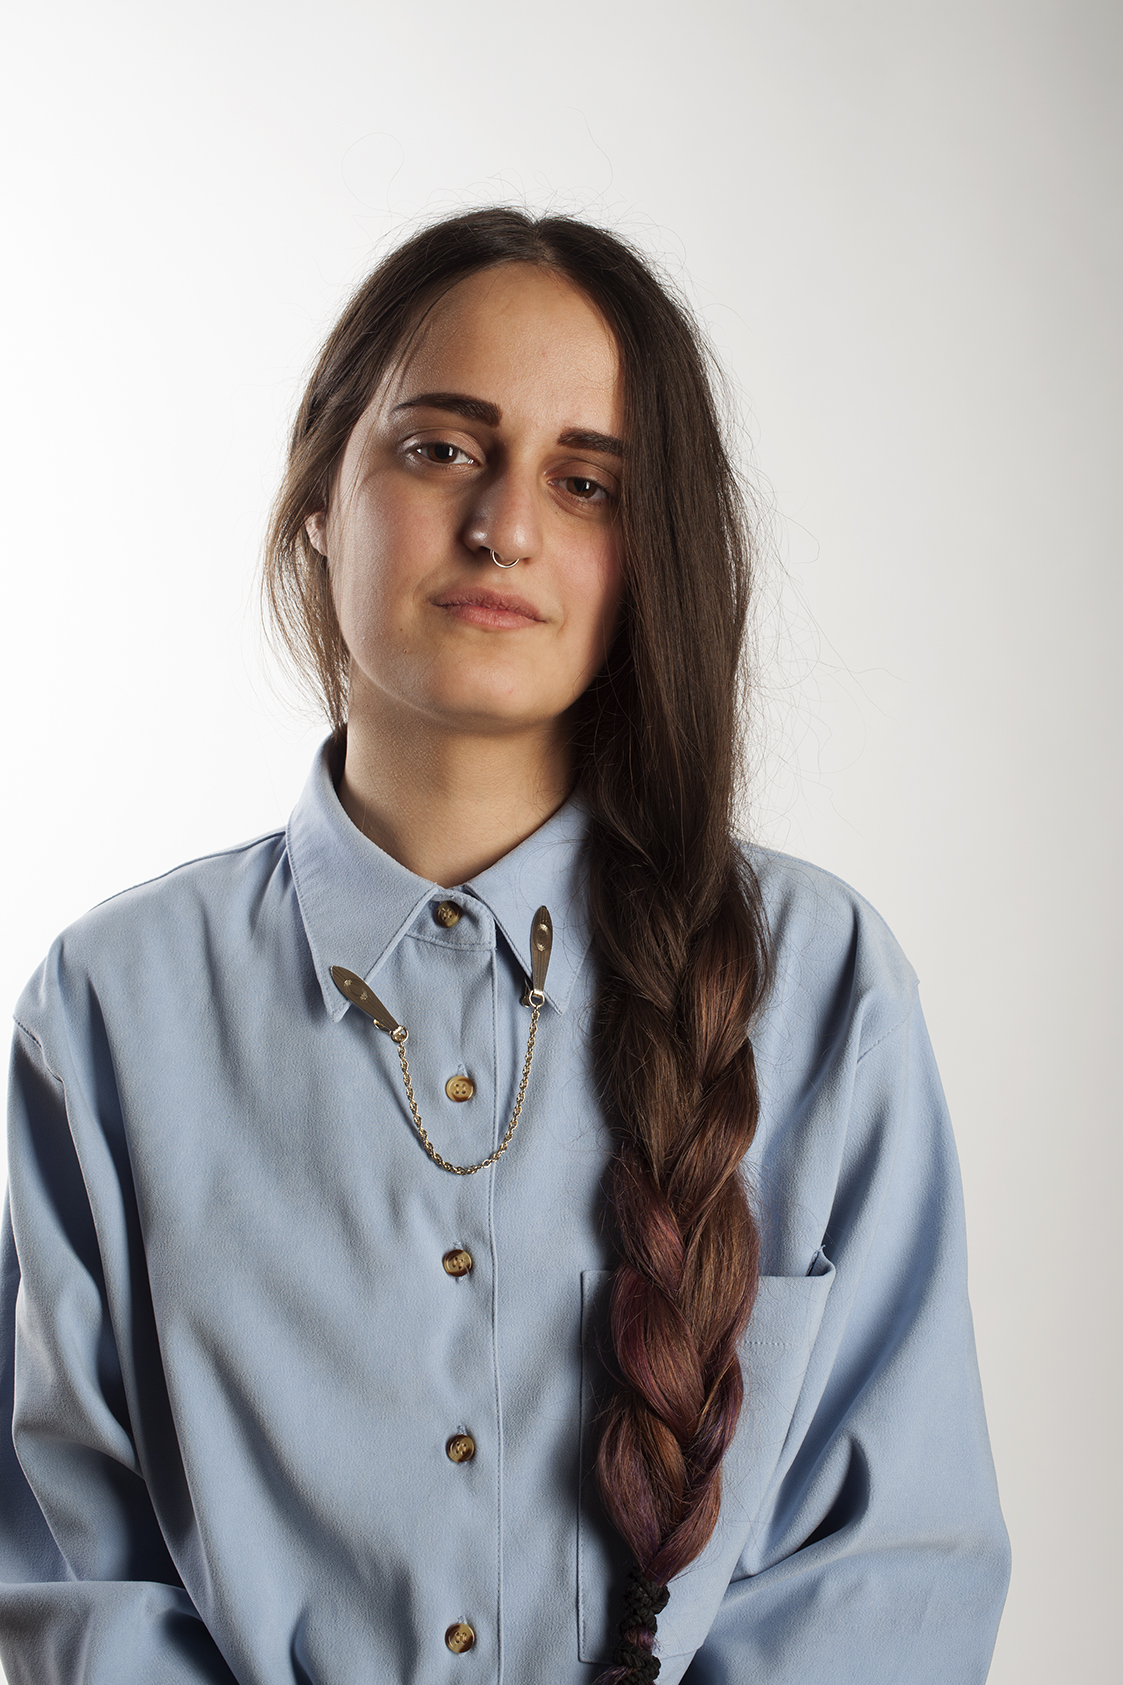 Elisabetta Silvestri, Italian fashion designer.